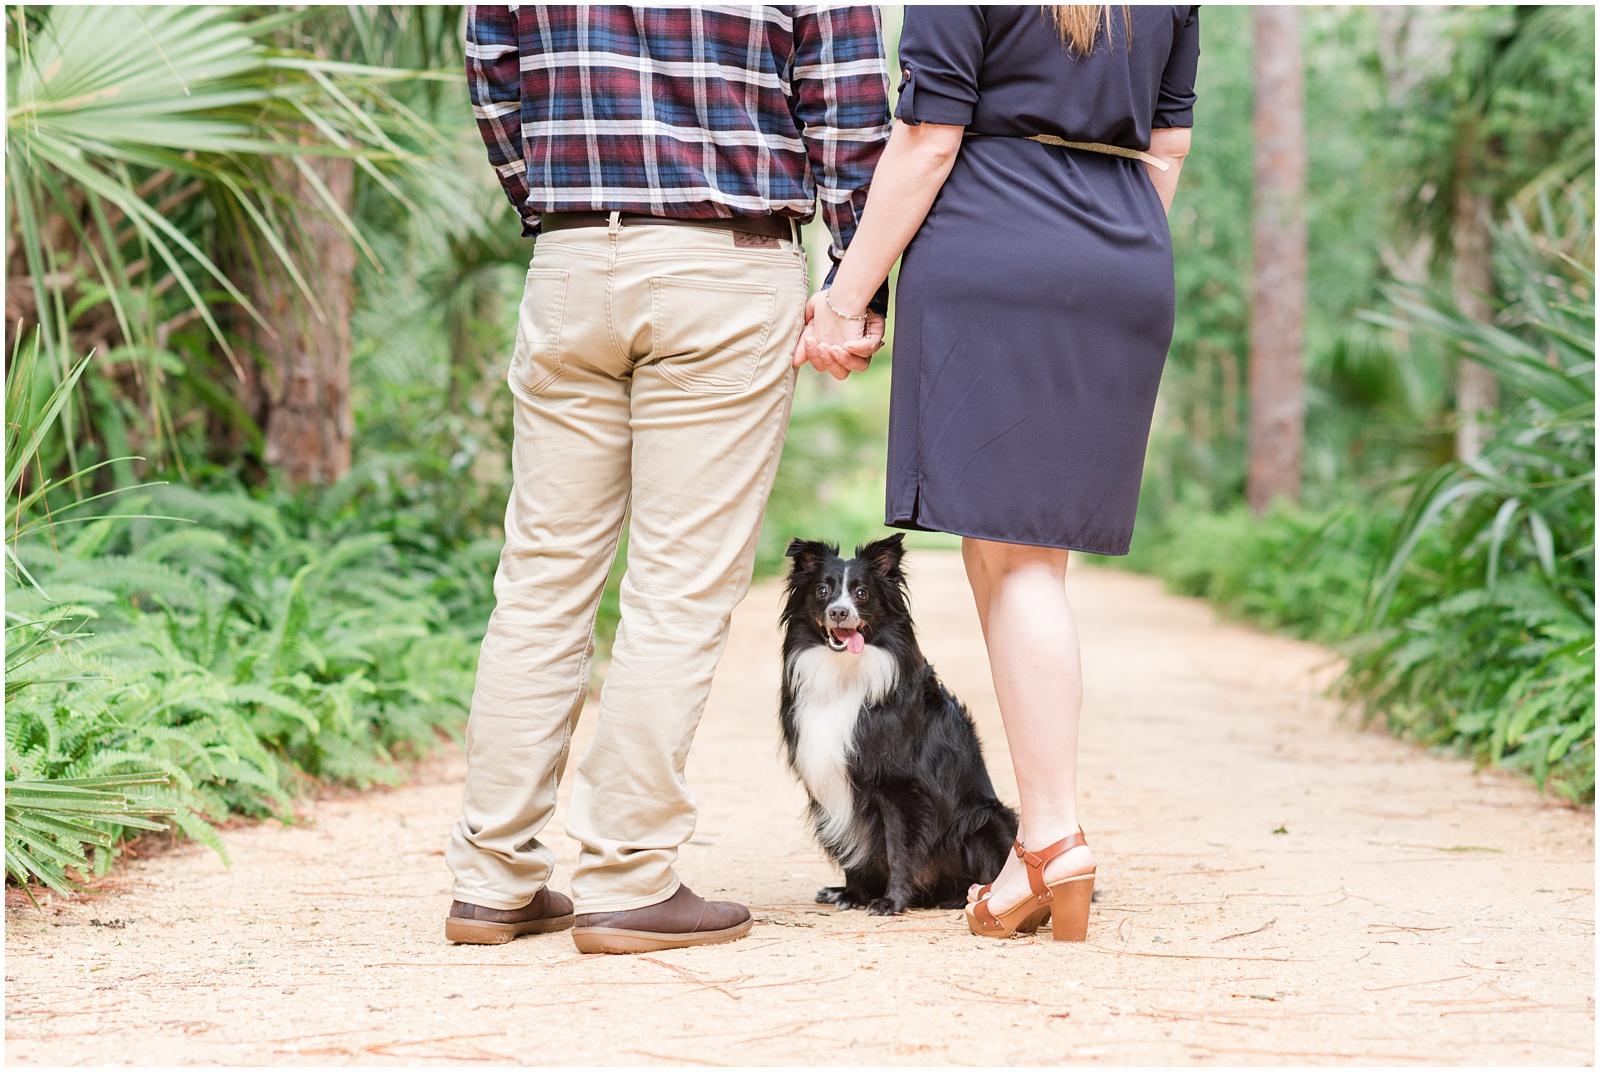 Palm Coast_Washington Oaks Garden_State Park_Engagement_Portraits_7.jpg